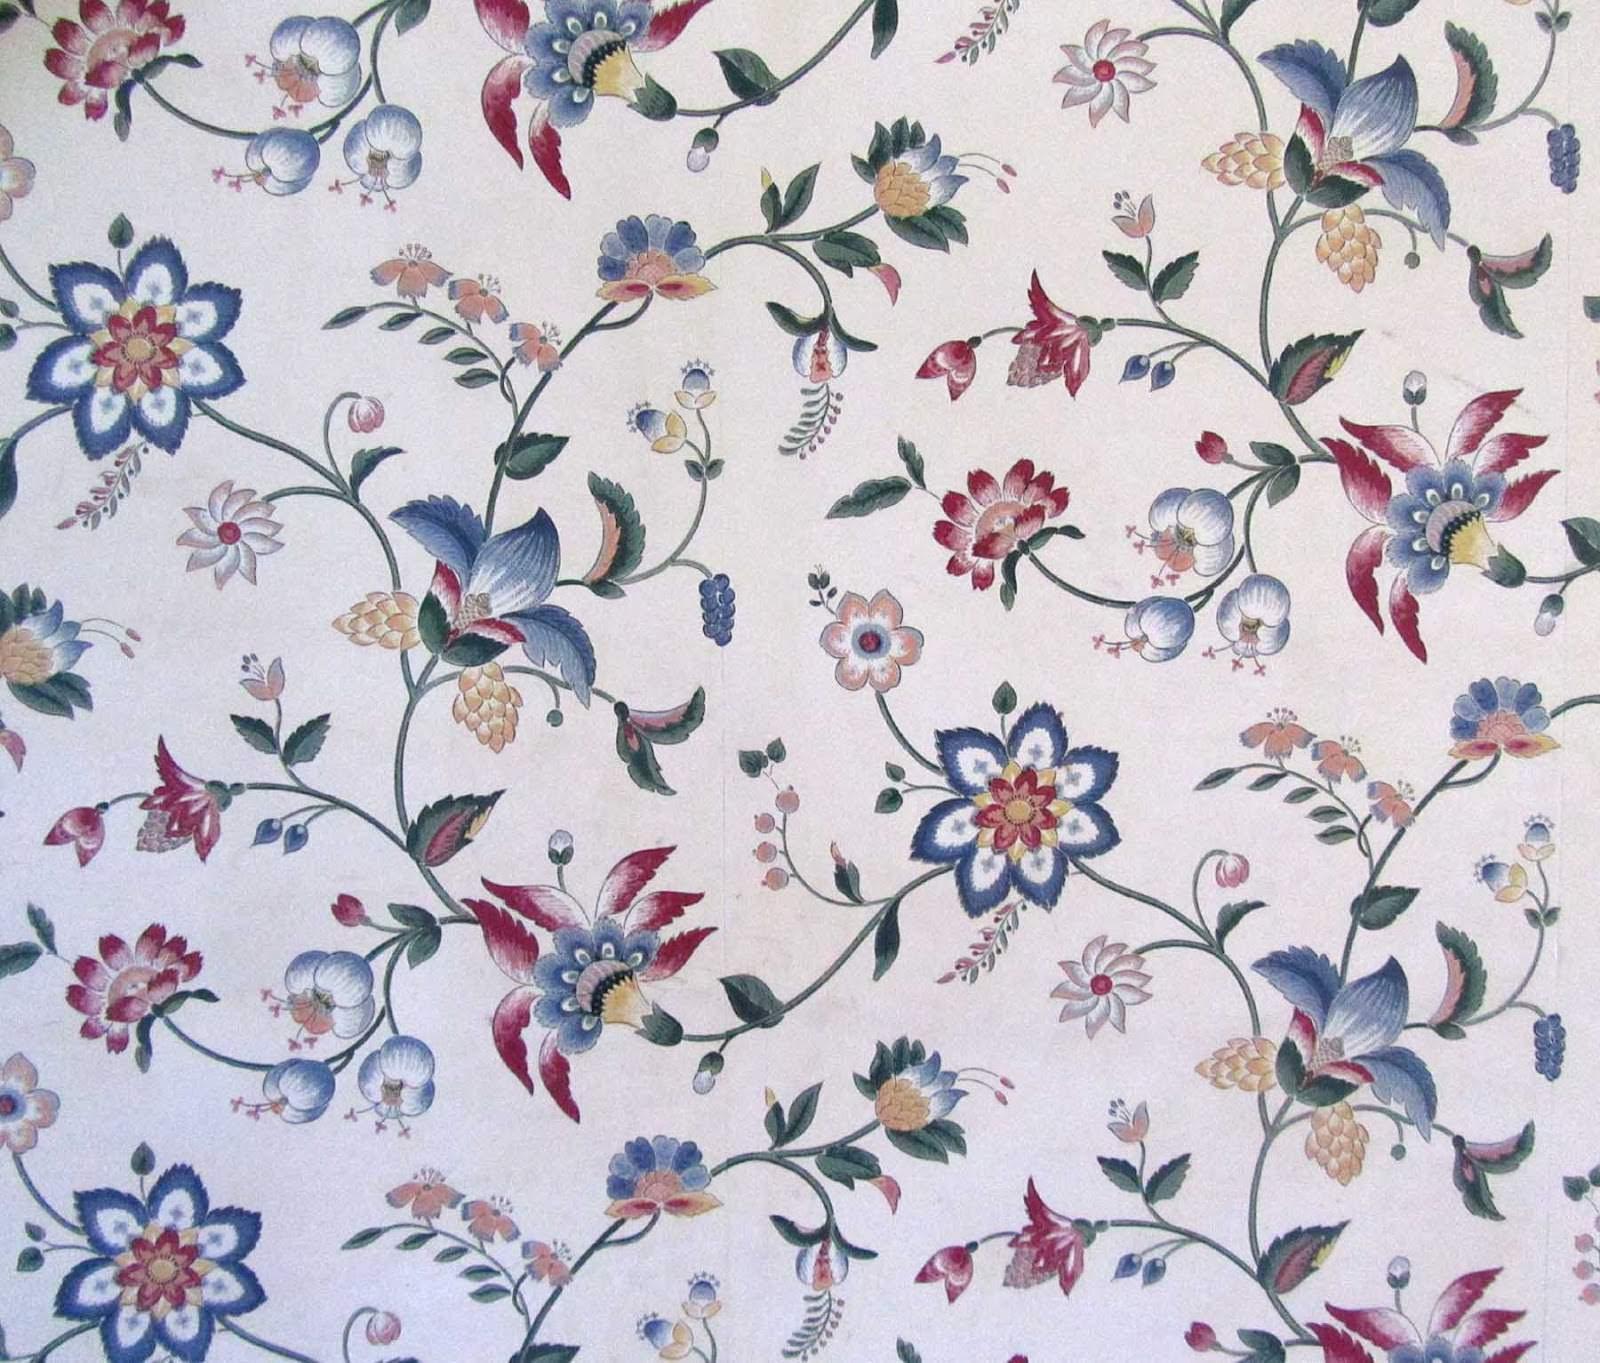 Fascinating Vintage Flower Wallpaper